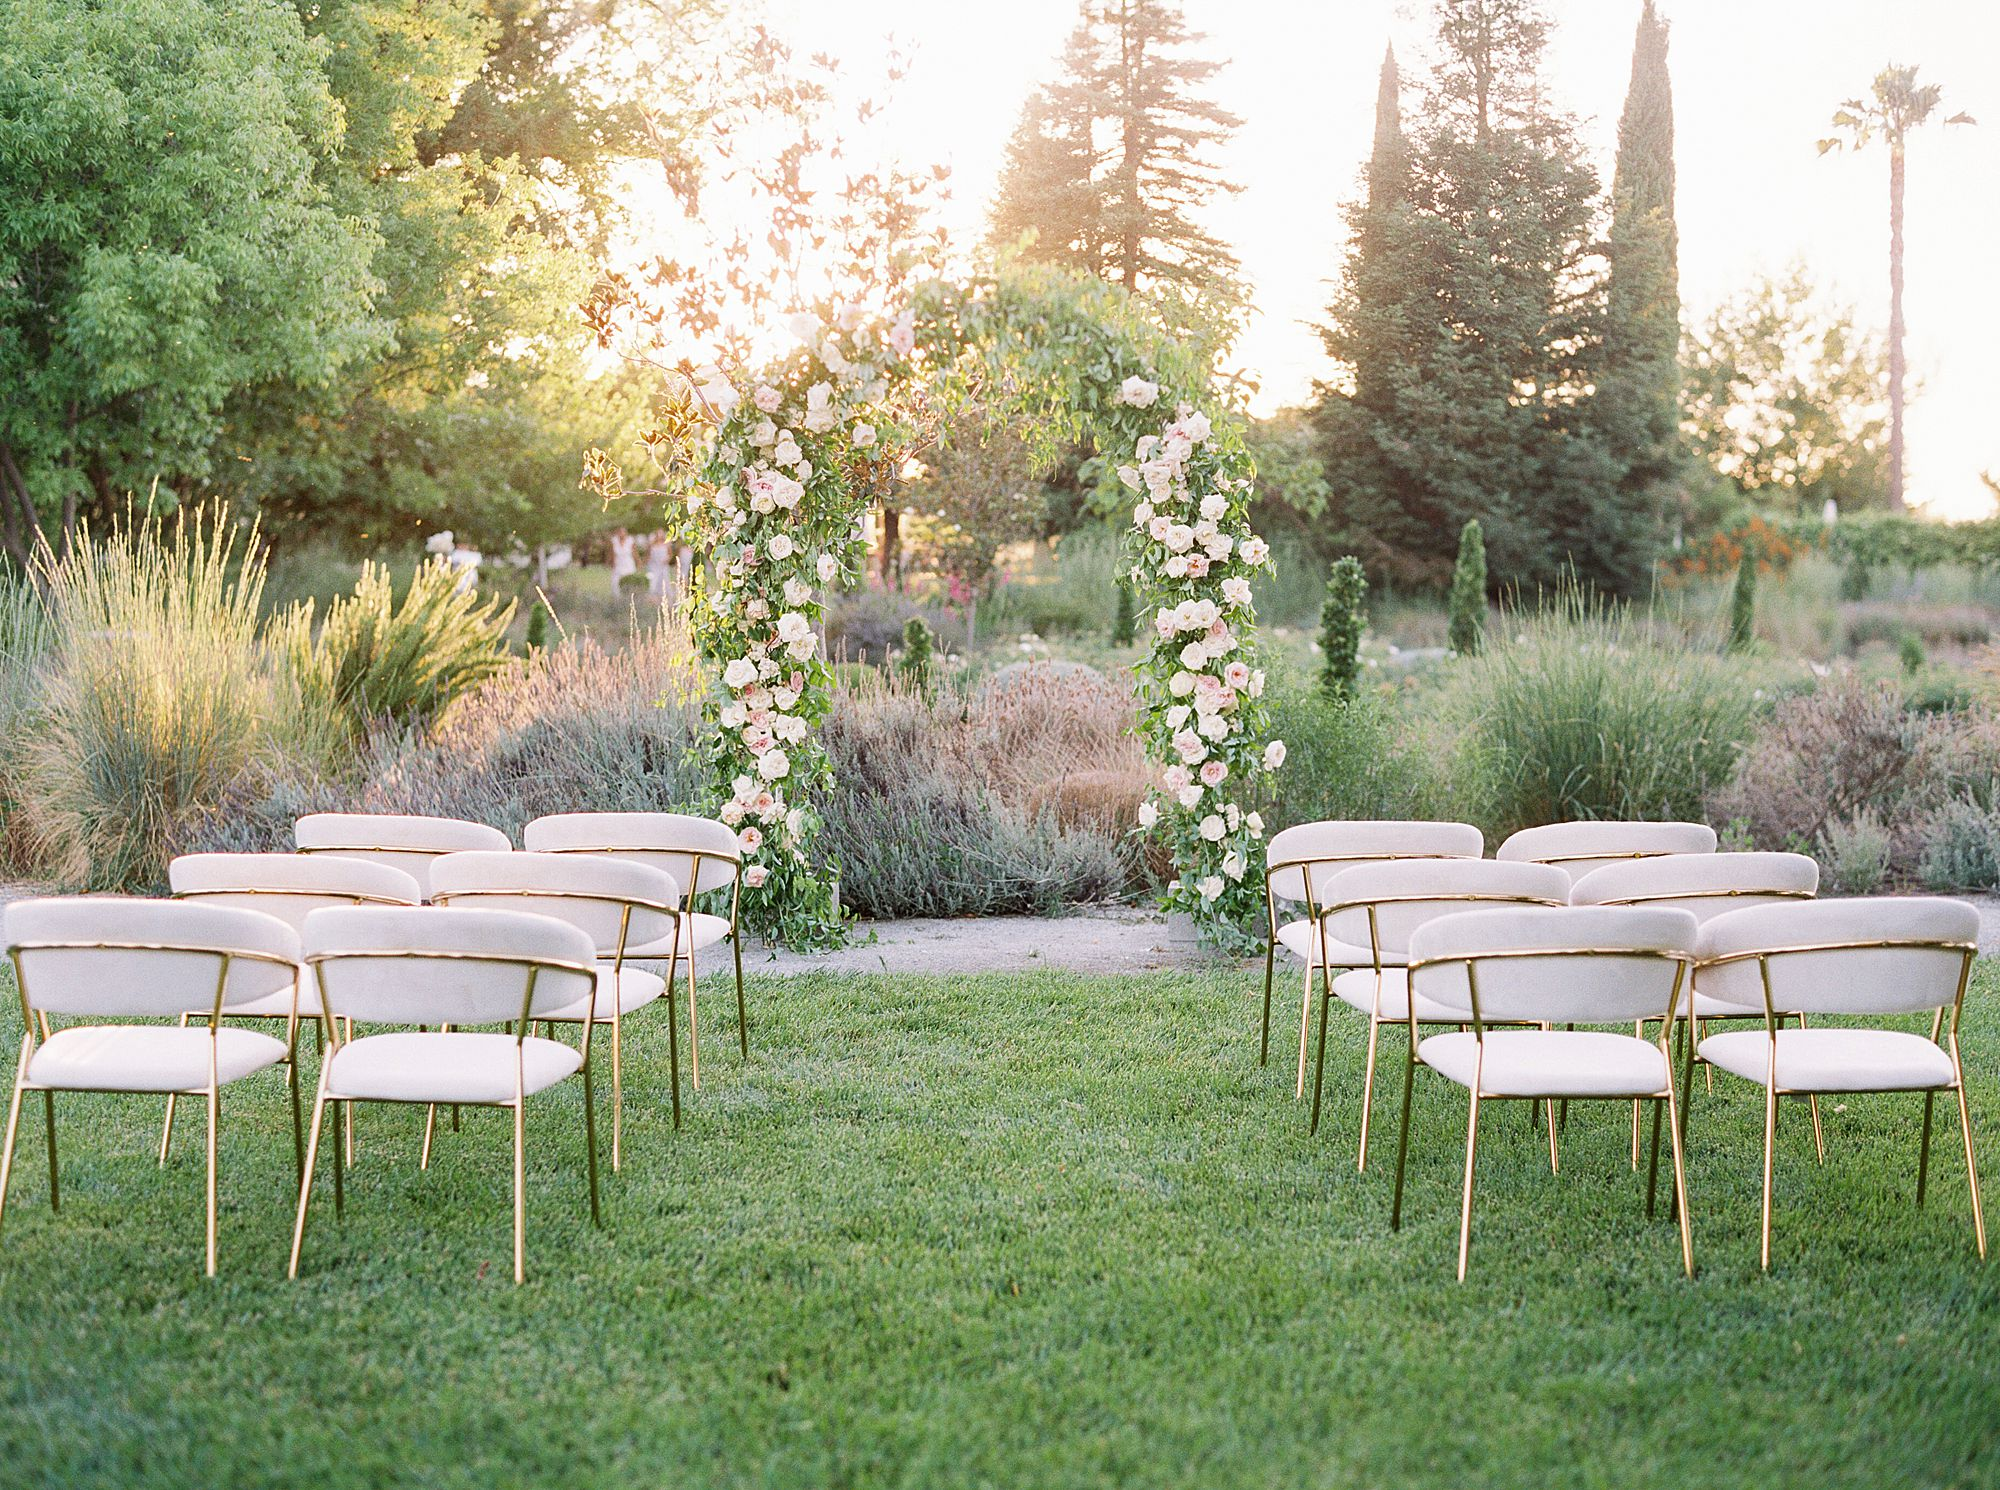 Park Winters Micro-Wedding Inspiration on Style Me Pretty - Stephanie Teague Events - Ashley Baumgartner - Park Winters Wedding - Black Tie Wedding - Micro-Wedding Sacramento Photographer_0024.jpg